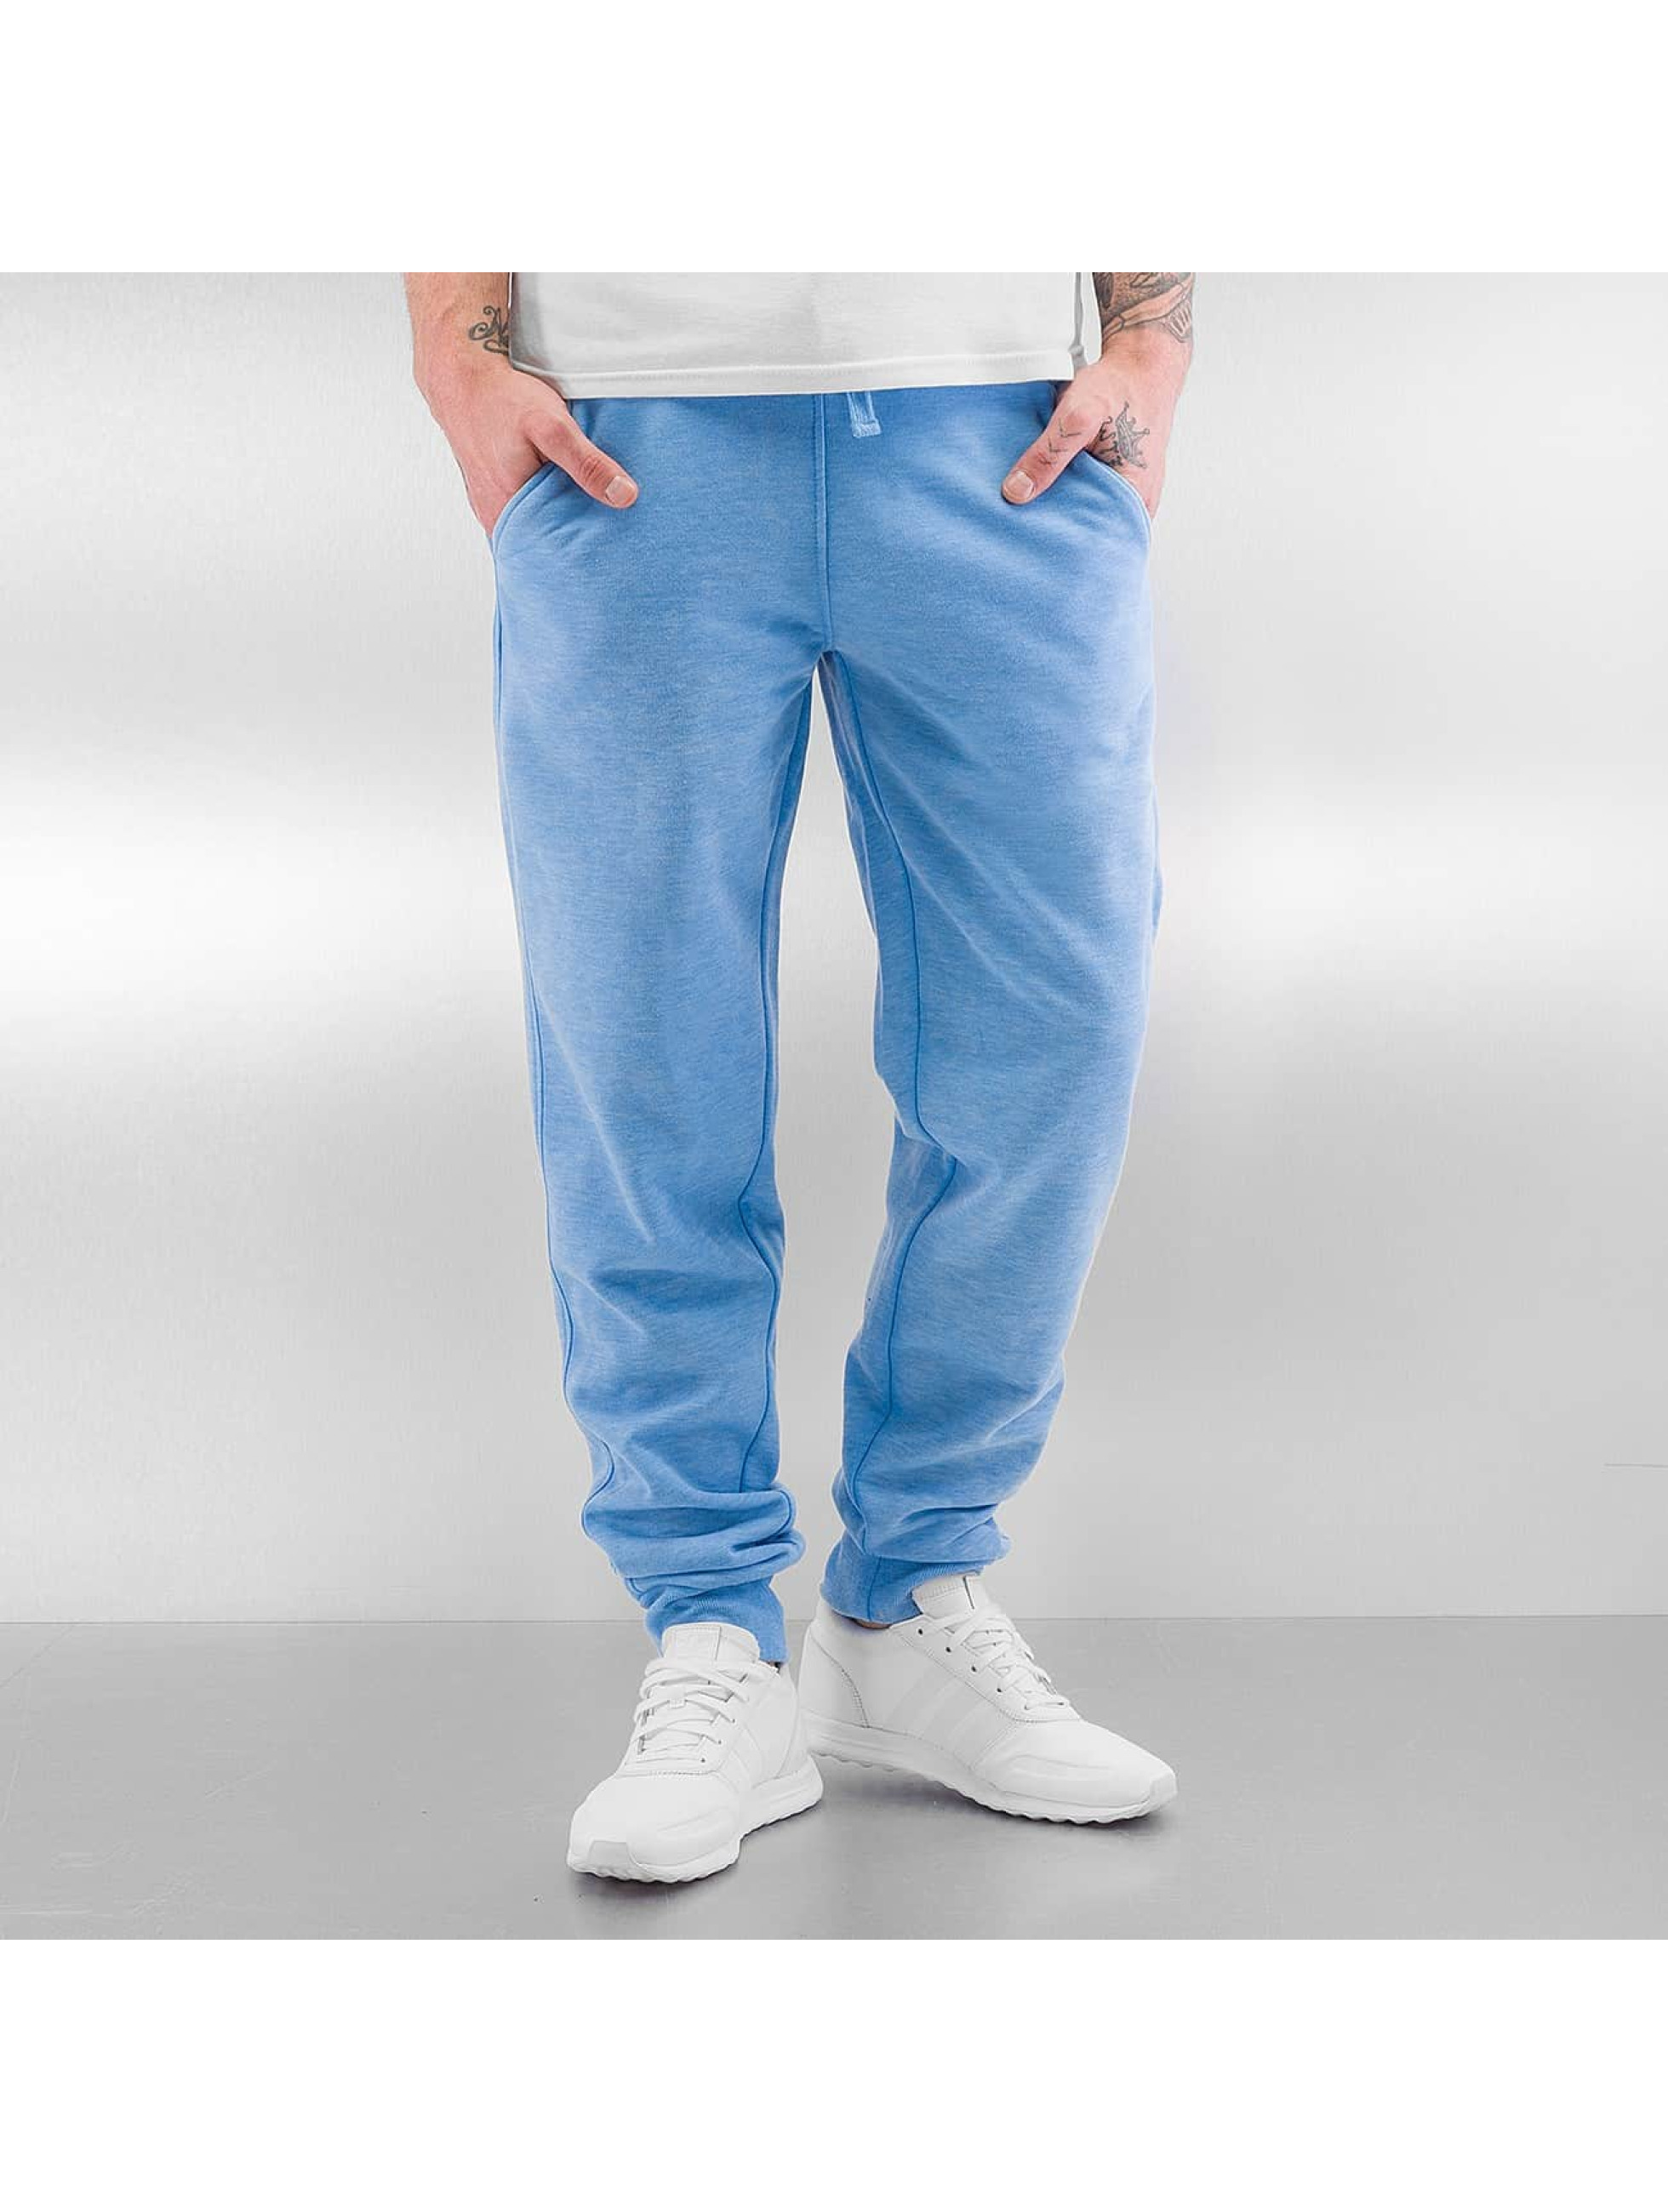 Urban Classics Jogginghose Burnout blau